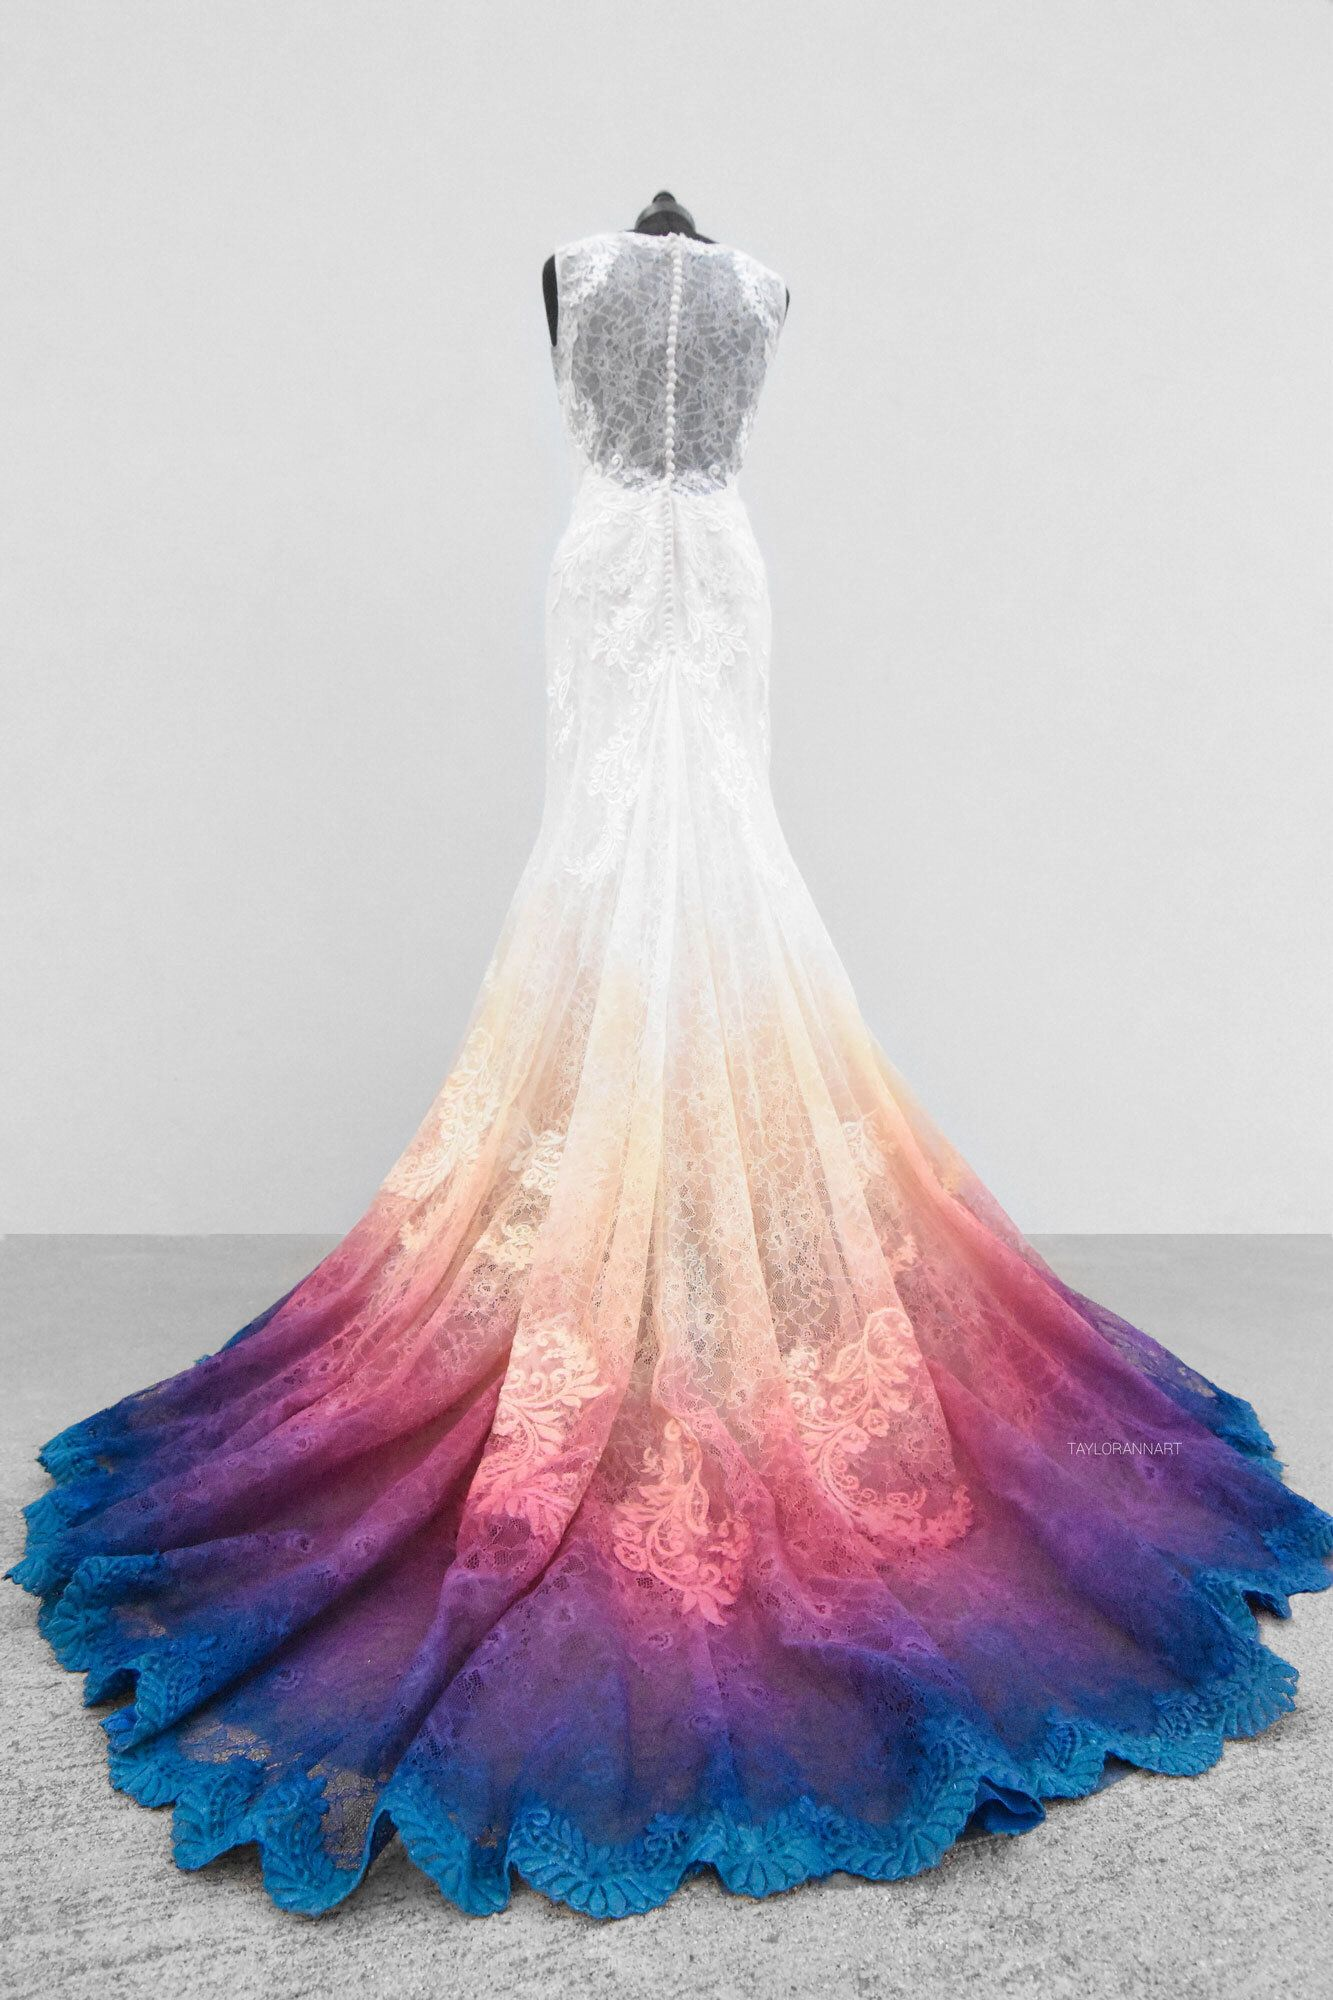 I Painted My Wedding Dress Taylor Ann Art Dye Wedding Dress Dresses Ball Dresses [ 2000 x 1333 Pixel ]